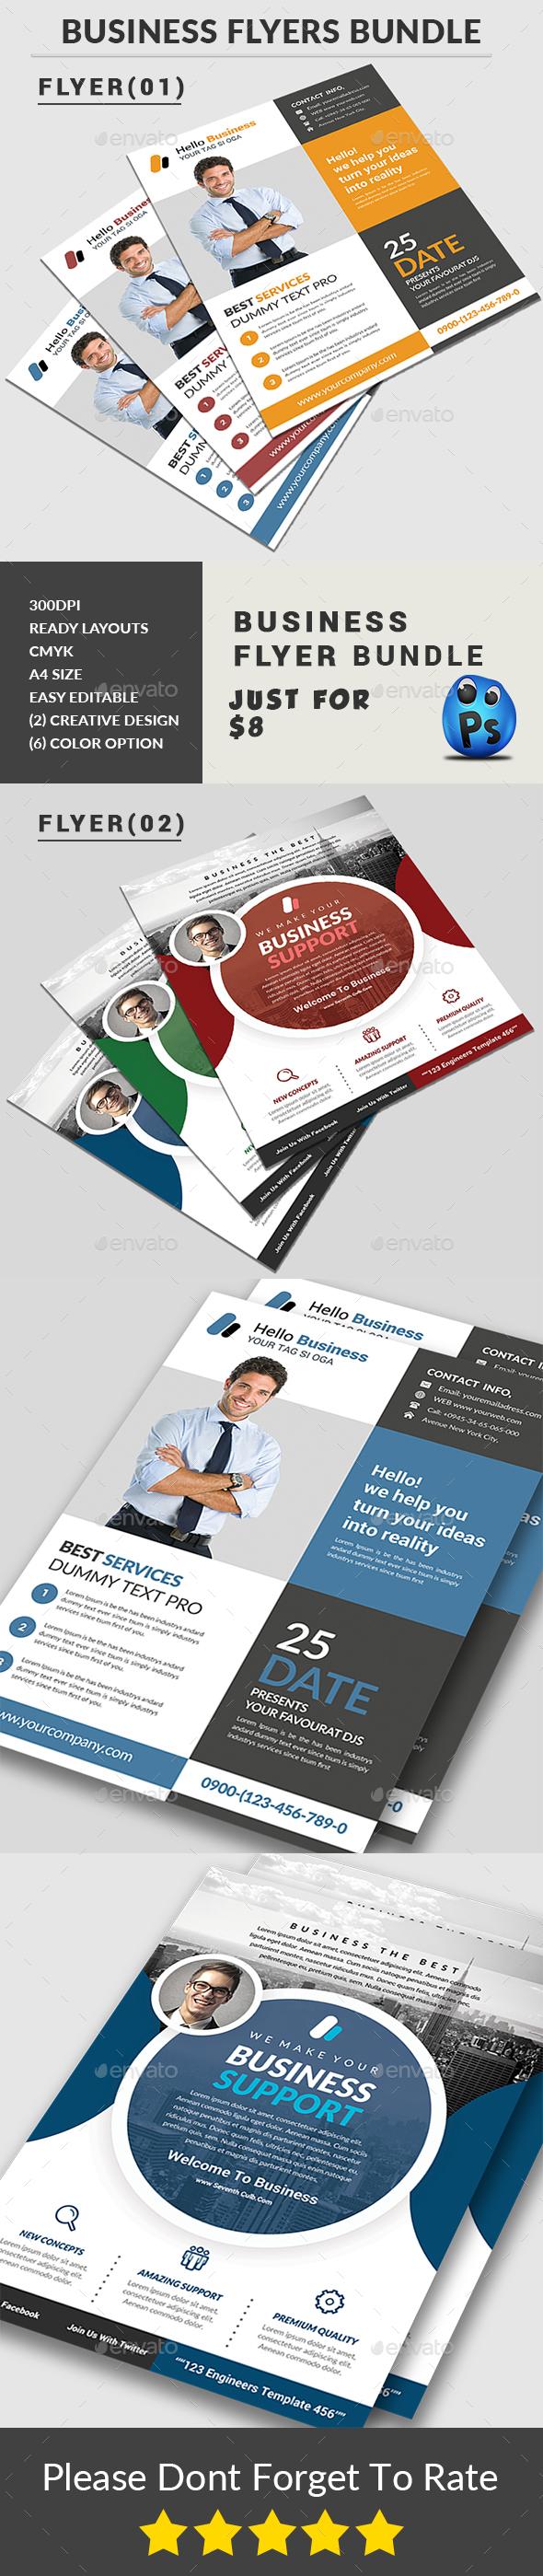 Business Flyers Bundle - Corporate Flyers